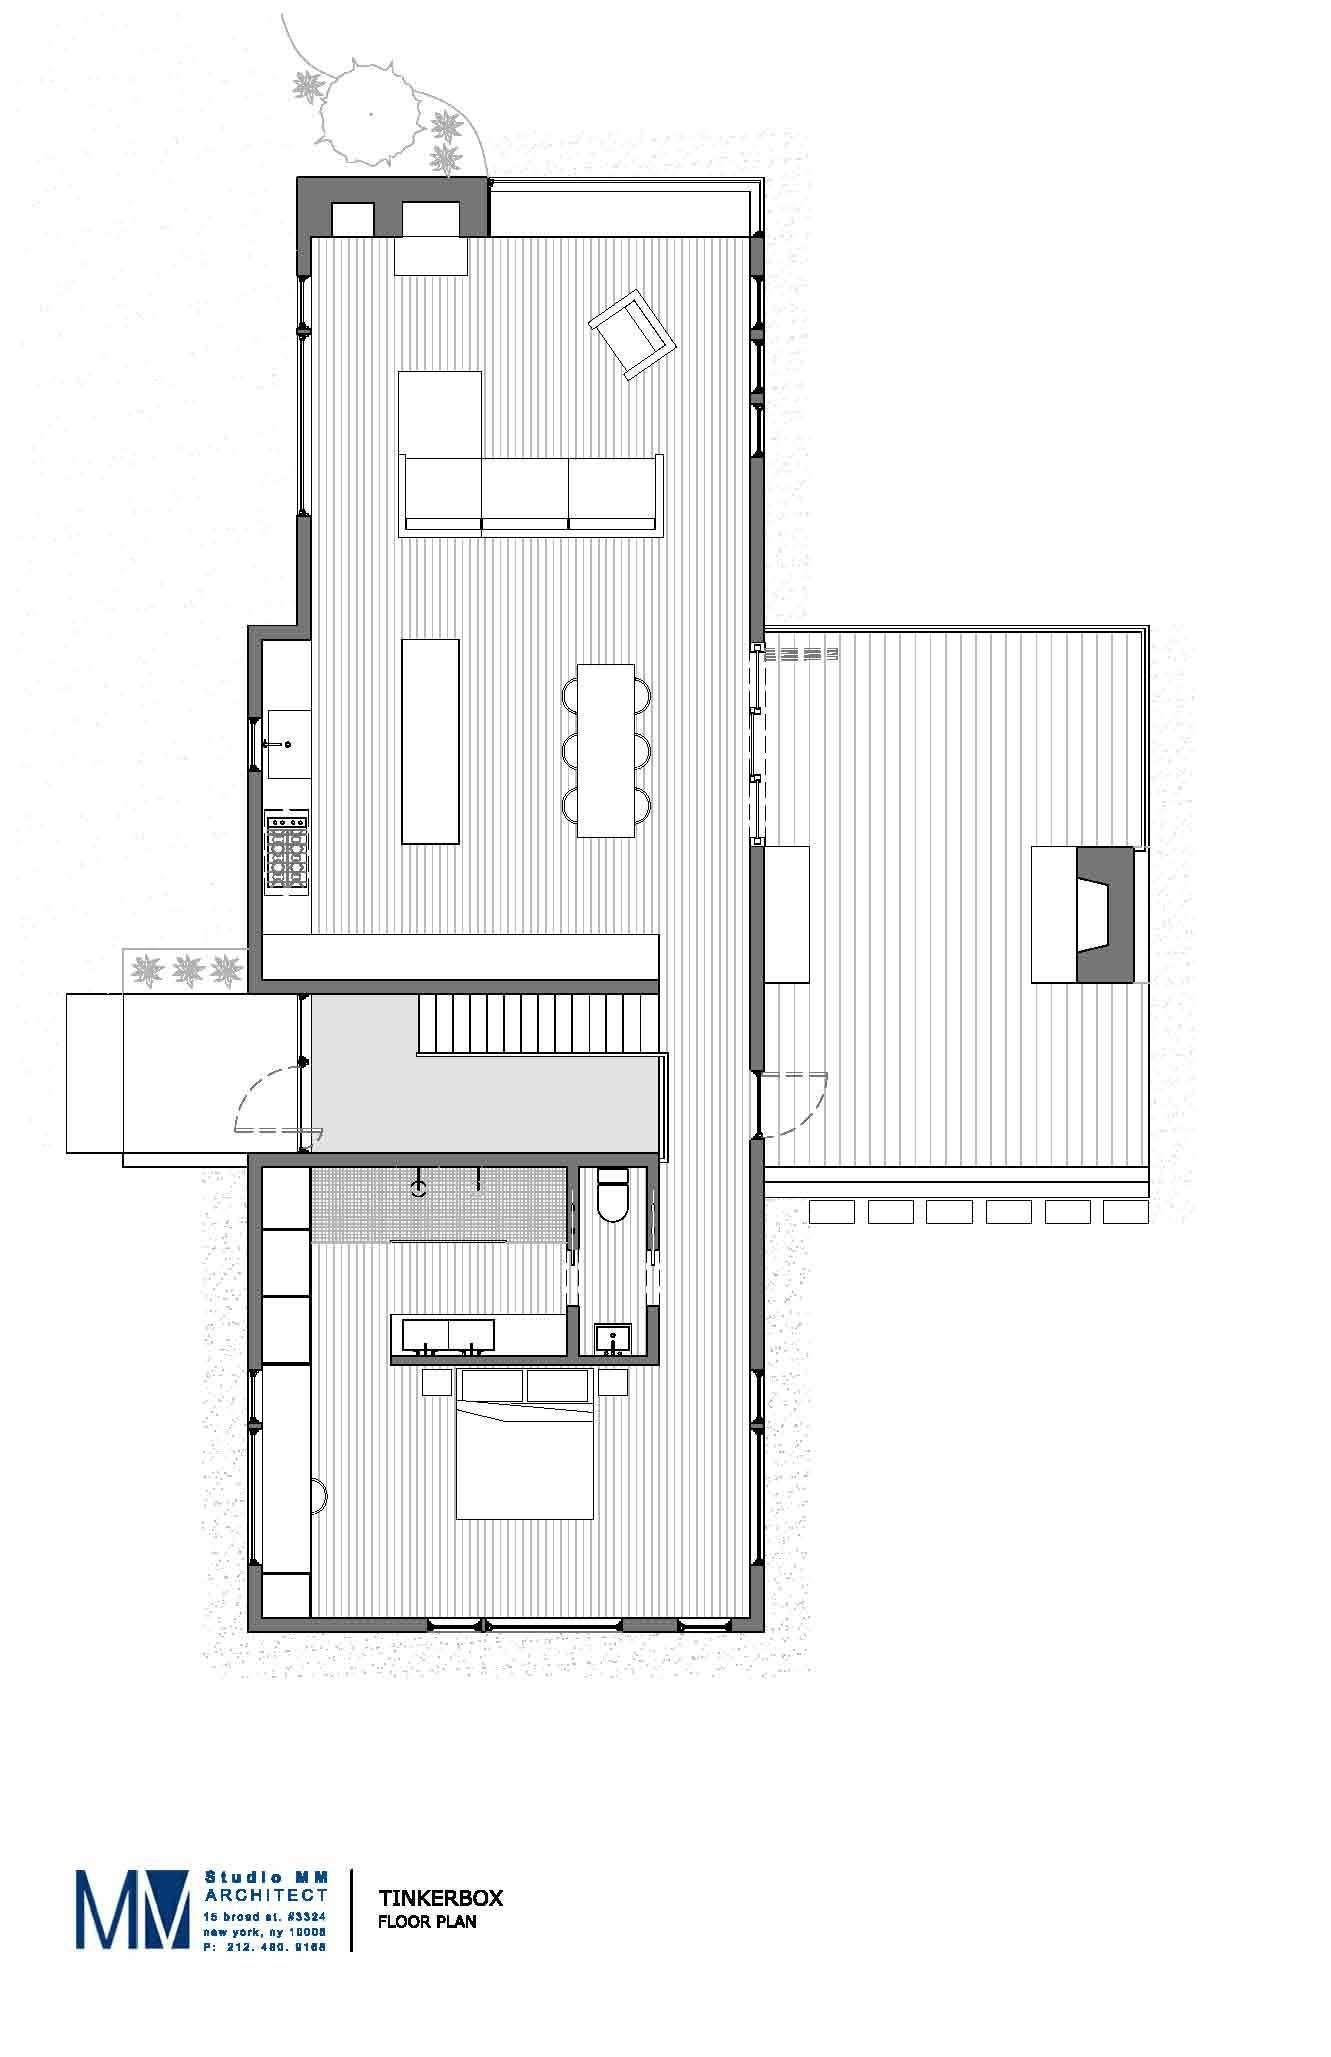 Gallery Of Tinkerbox Studio Mm Architect 11 House Floor Plans House Plans Floor Plans